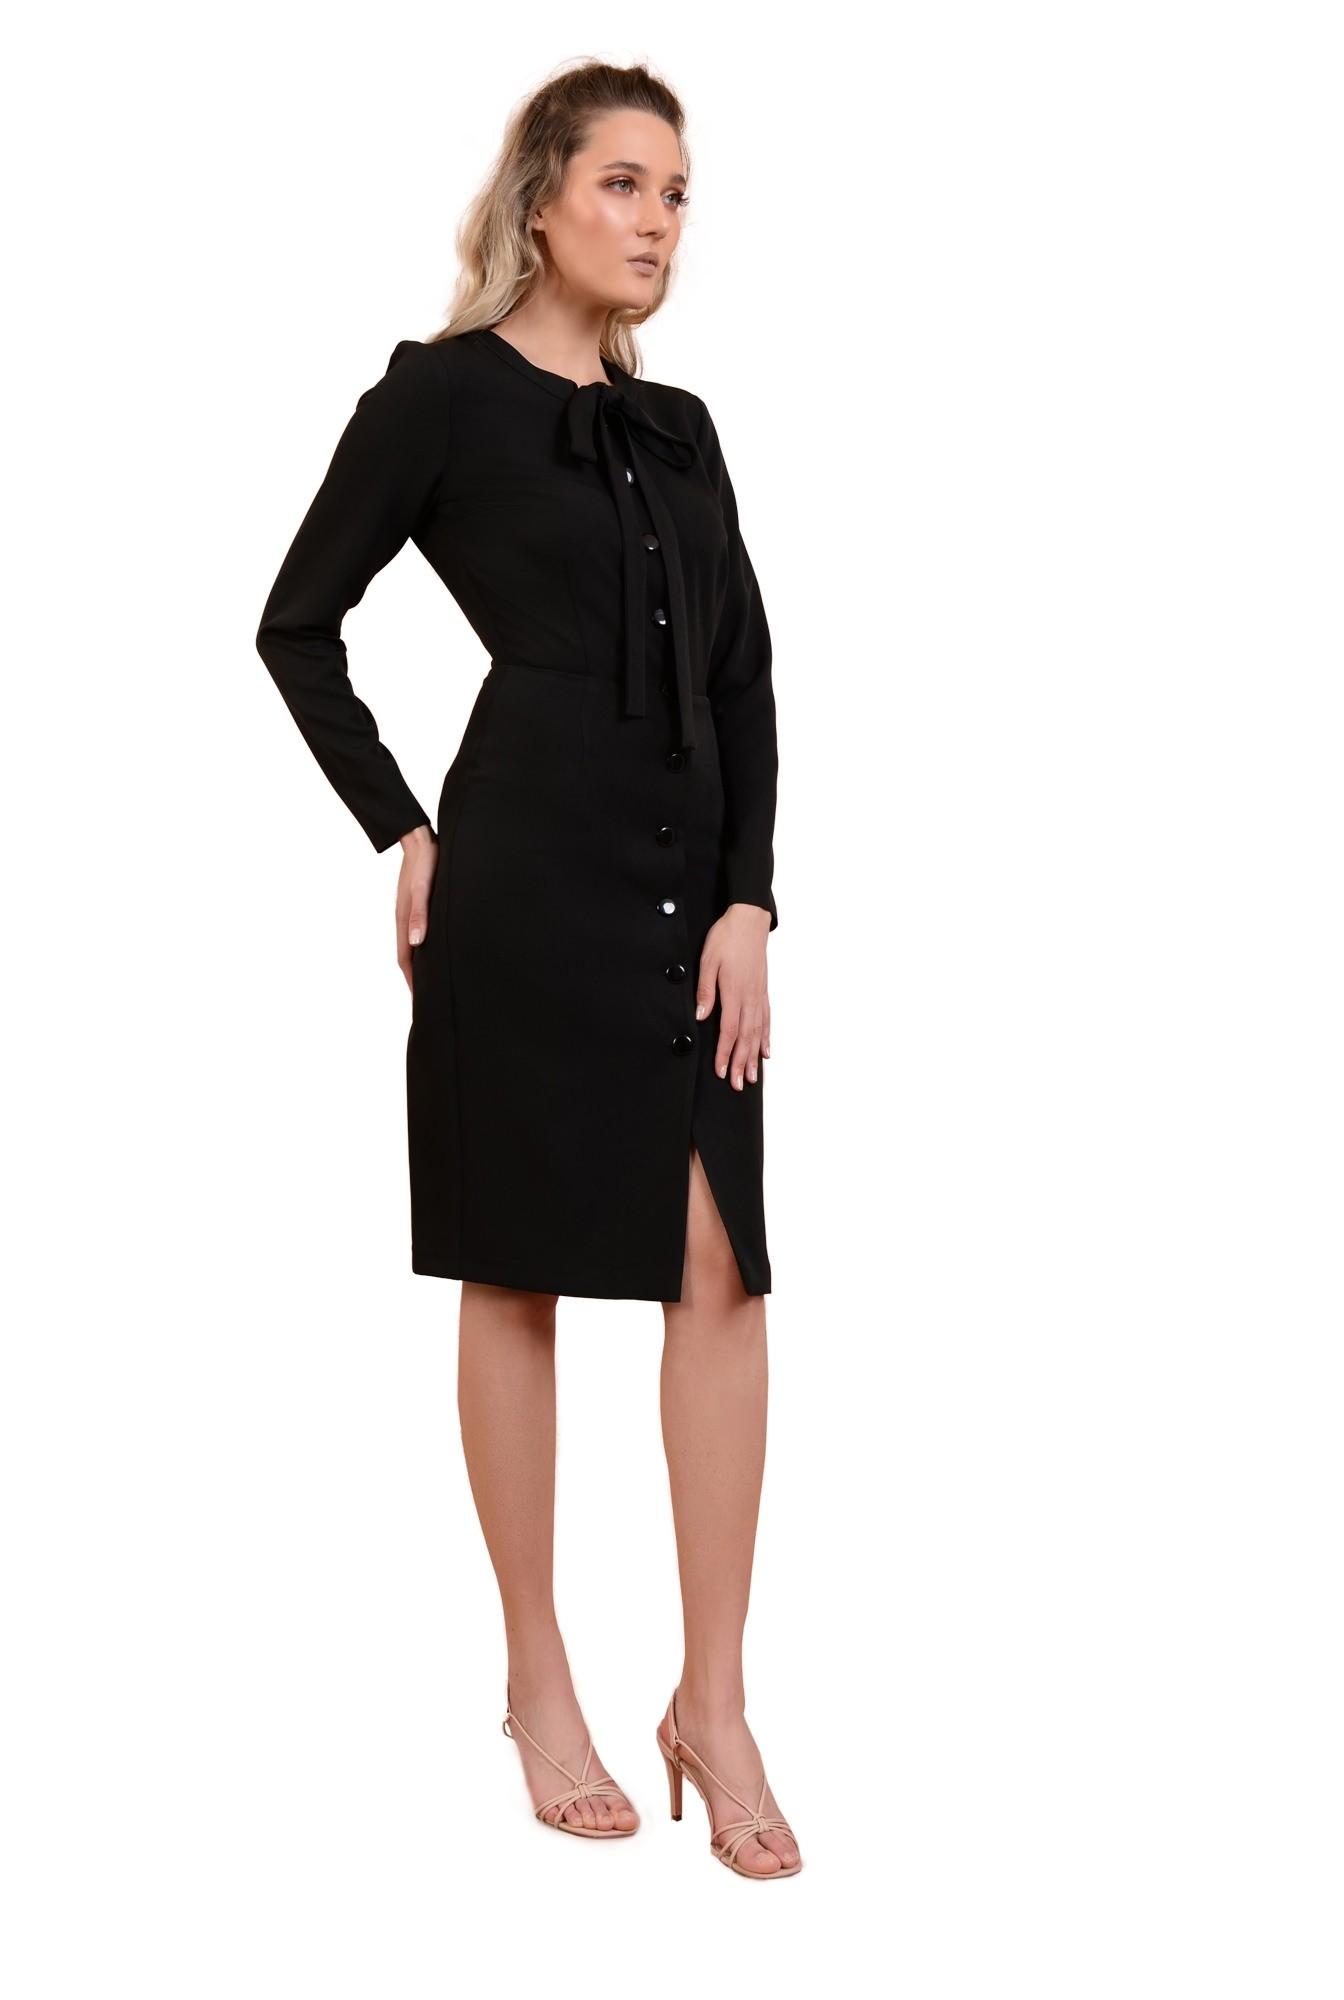 360 - rochie midi, ajustata, cu nasturi, maneci lungi, cu funda, Poema, negru